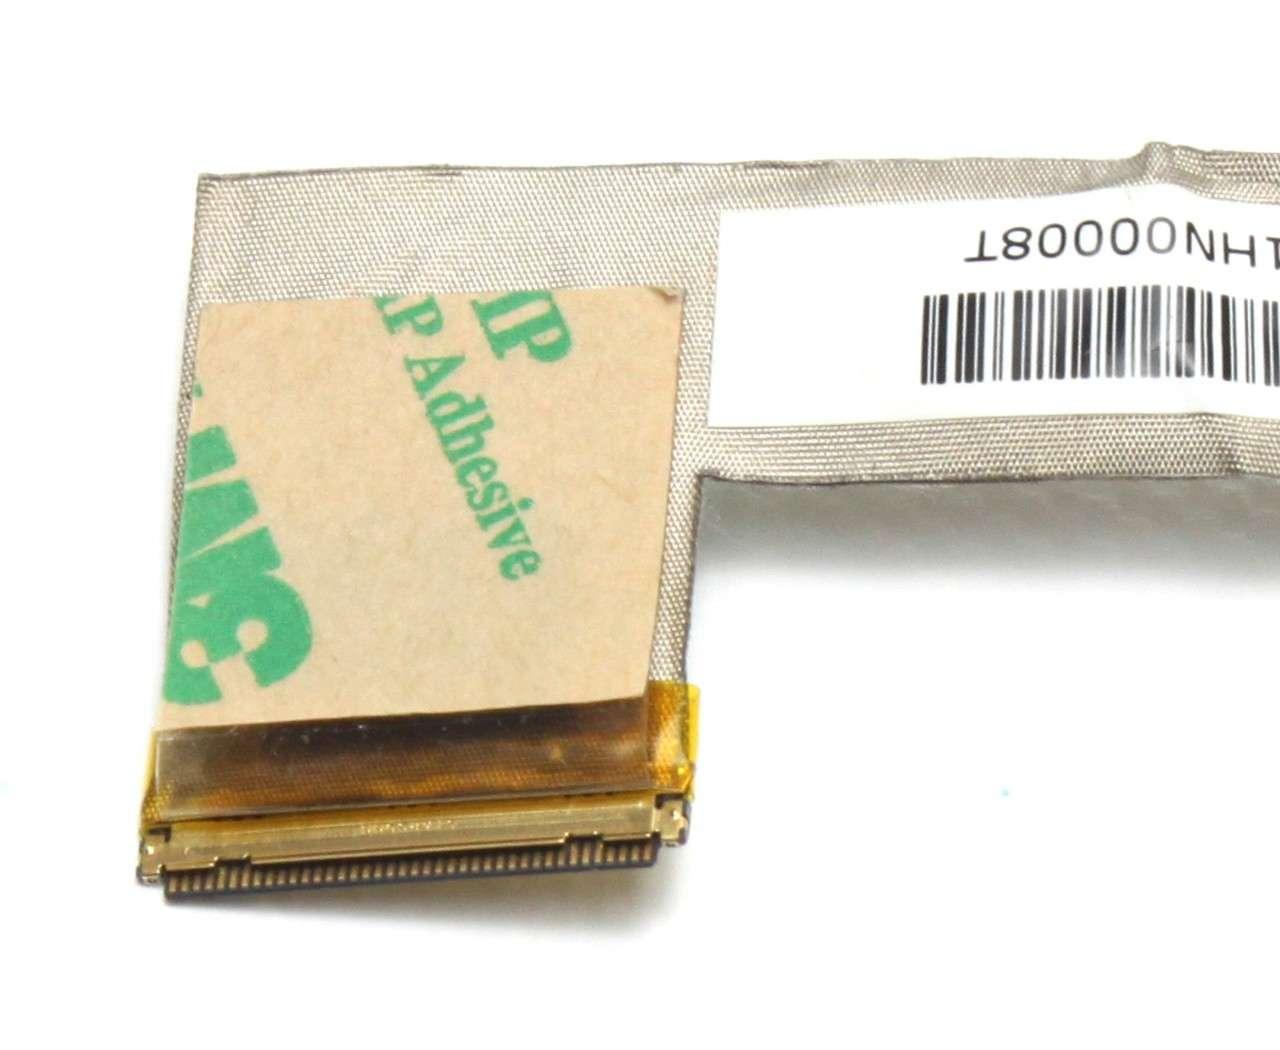 Cablu video LVDS Asus G53SX imagine powerlaptop.ro 2021